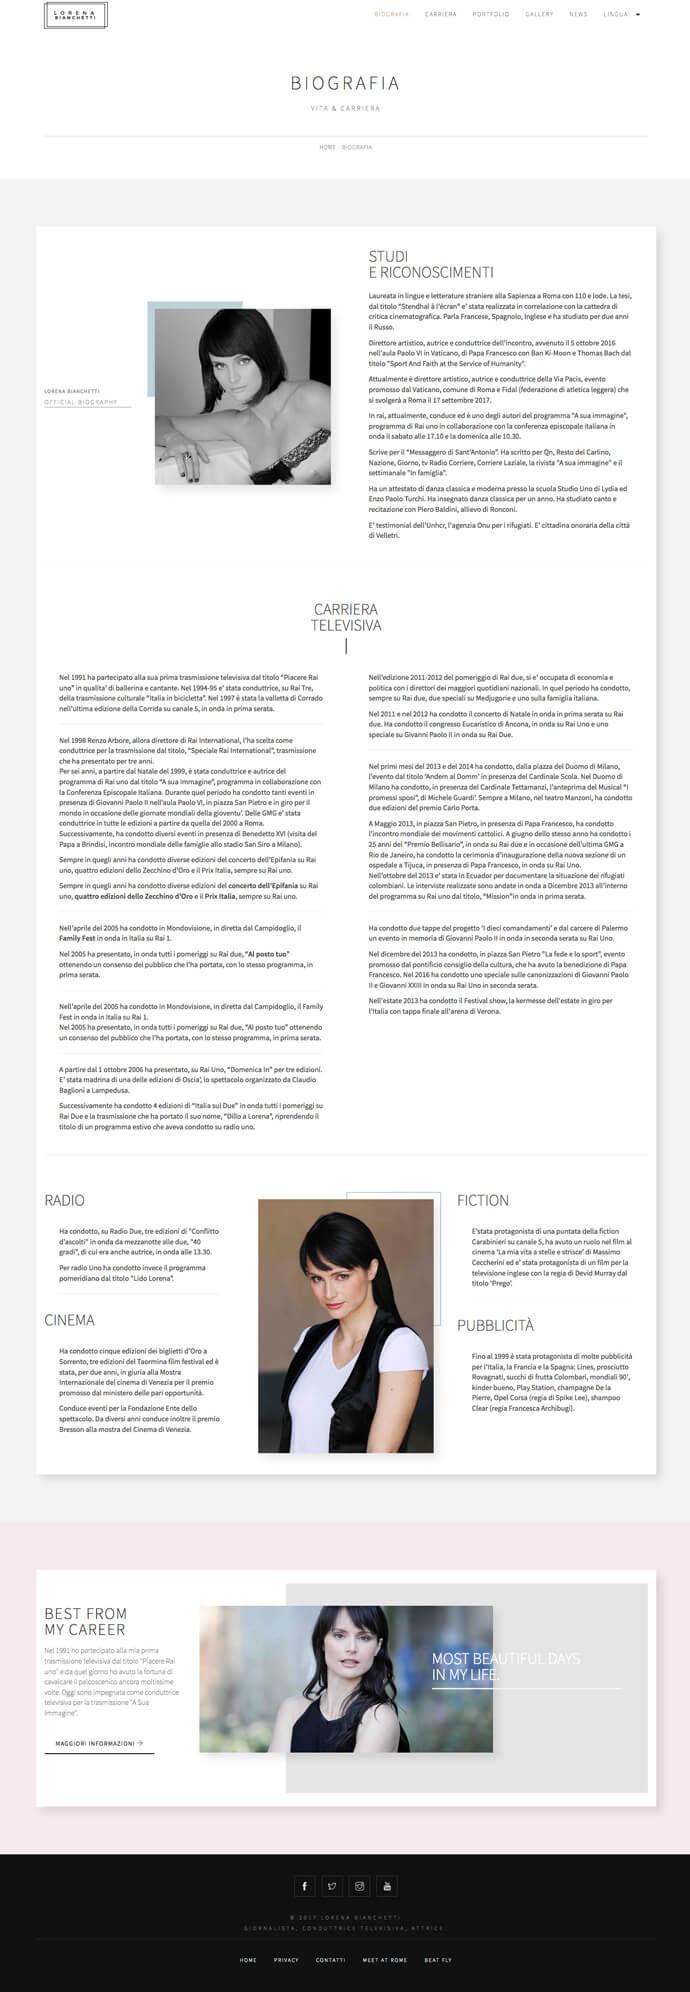 lorena-bianchetti-biografia